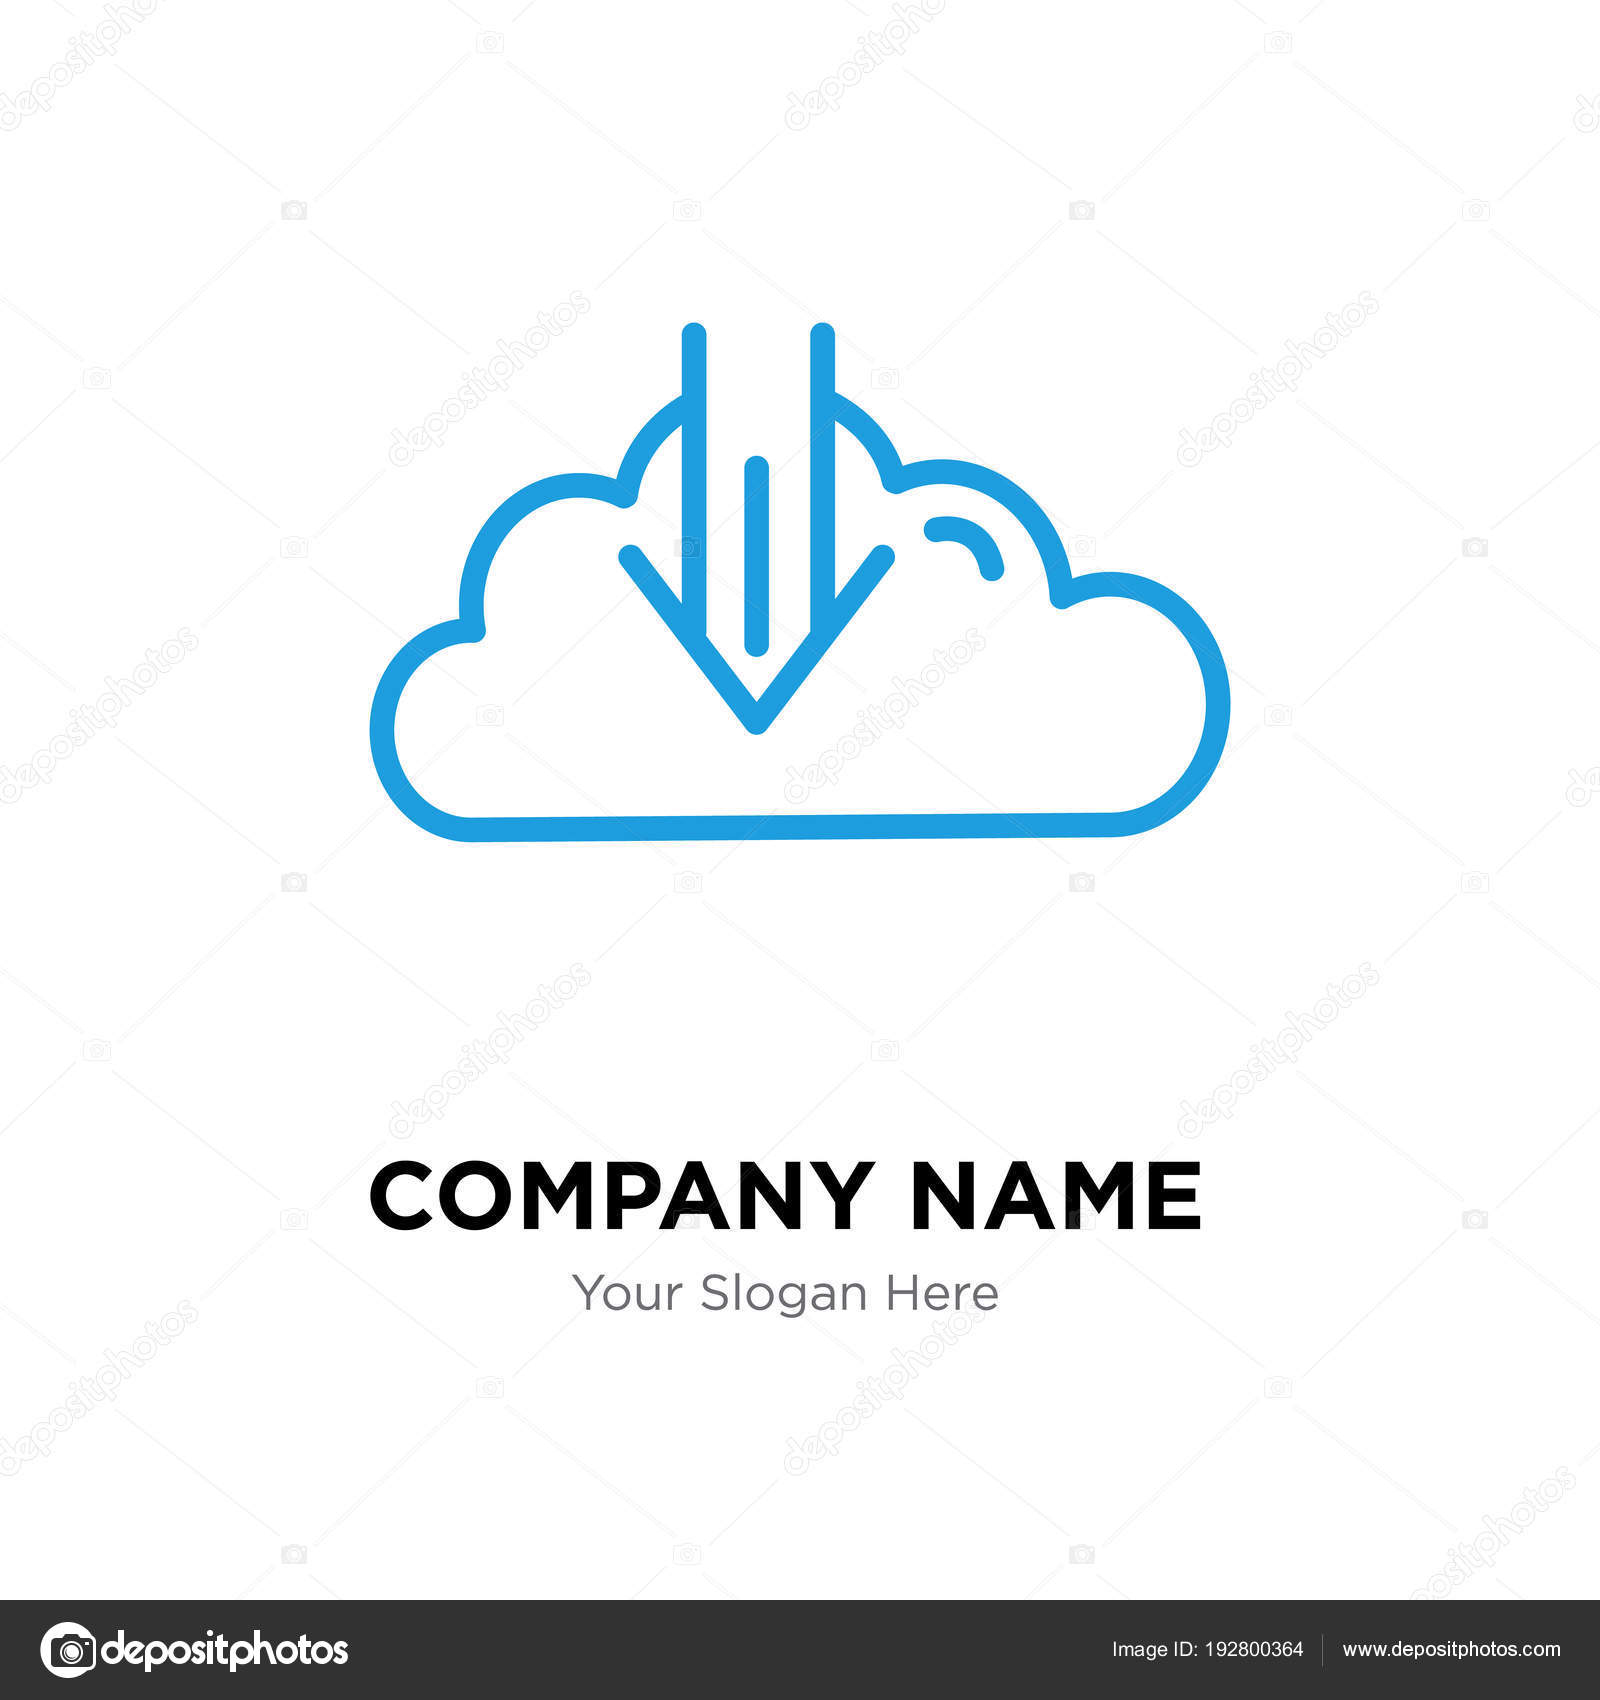 descargar plantilla de diseño de logo de empresa — Vector de stock ...